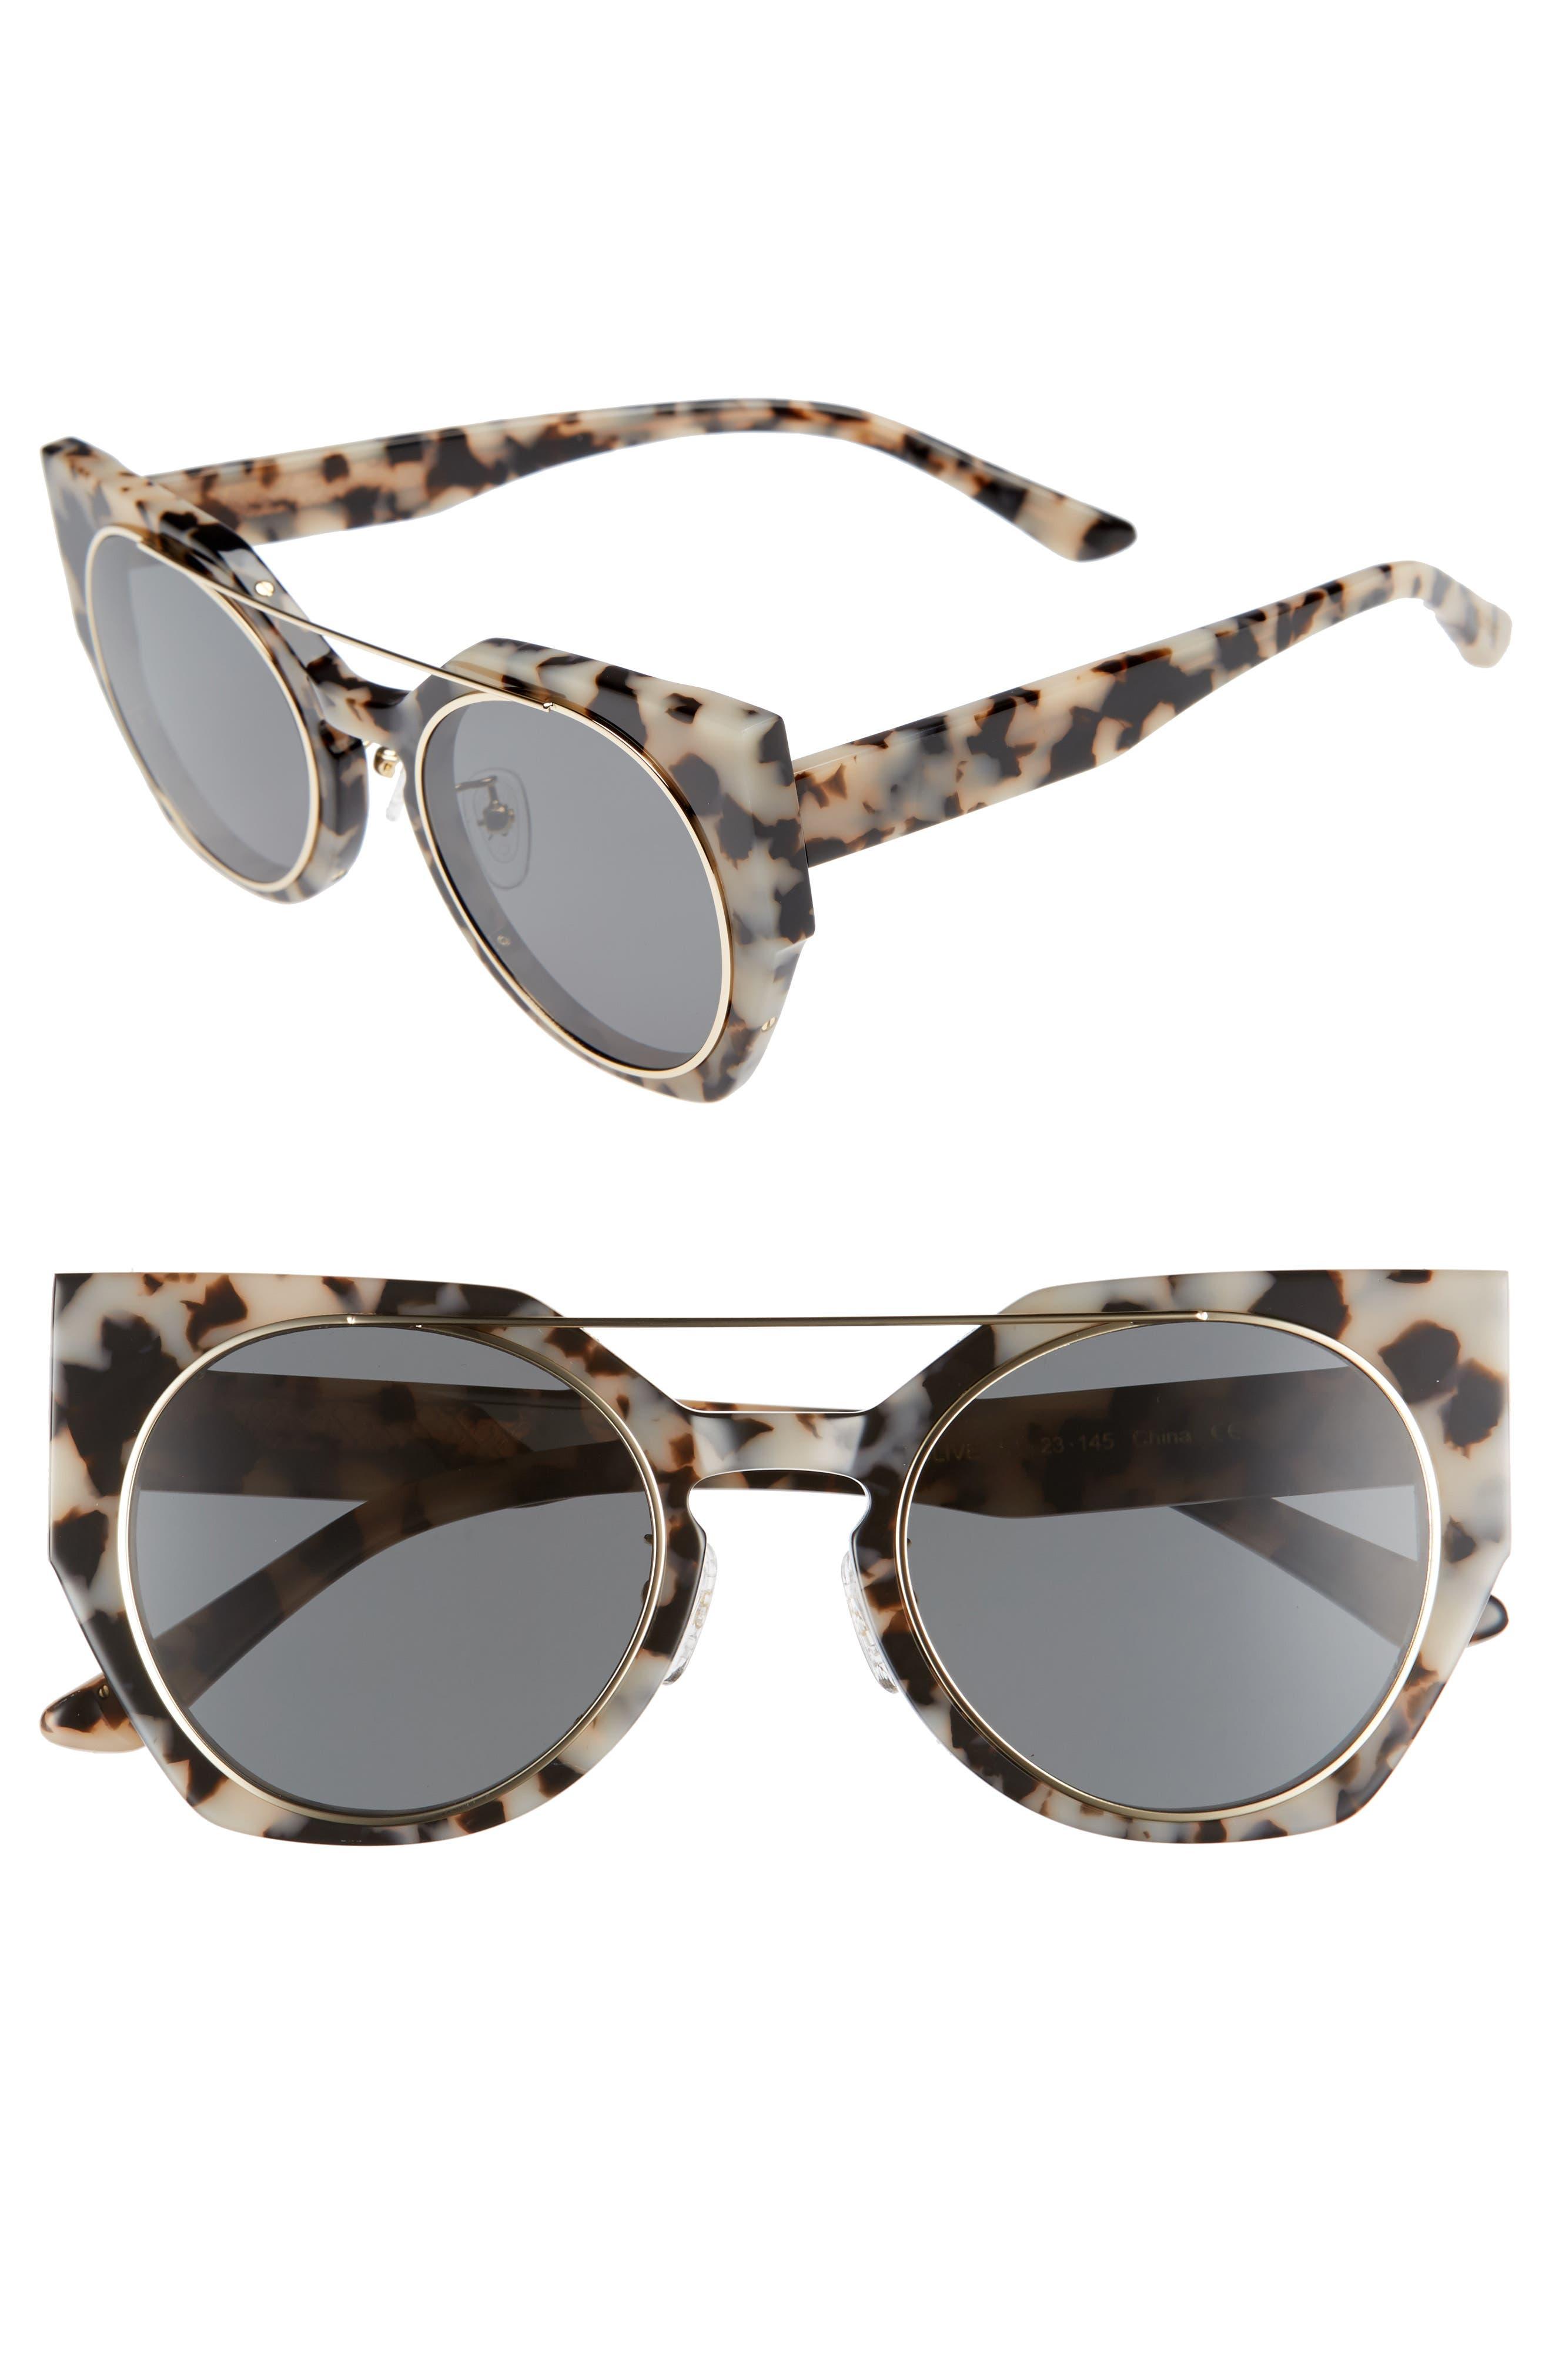 Main Image - Bonnie Clyde Olive 51mm Polarized Cat Eye Sunglasses